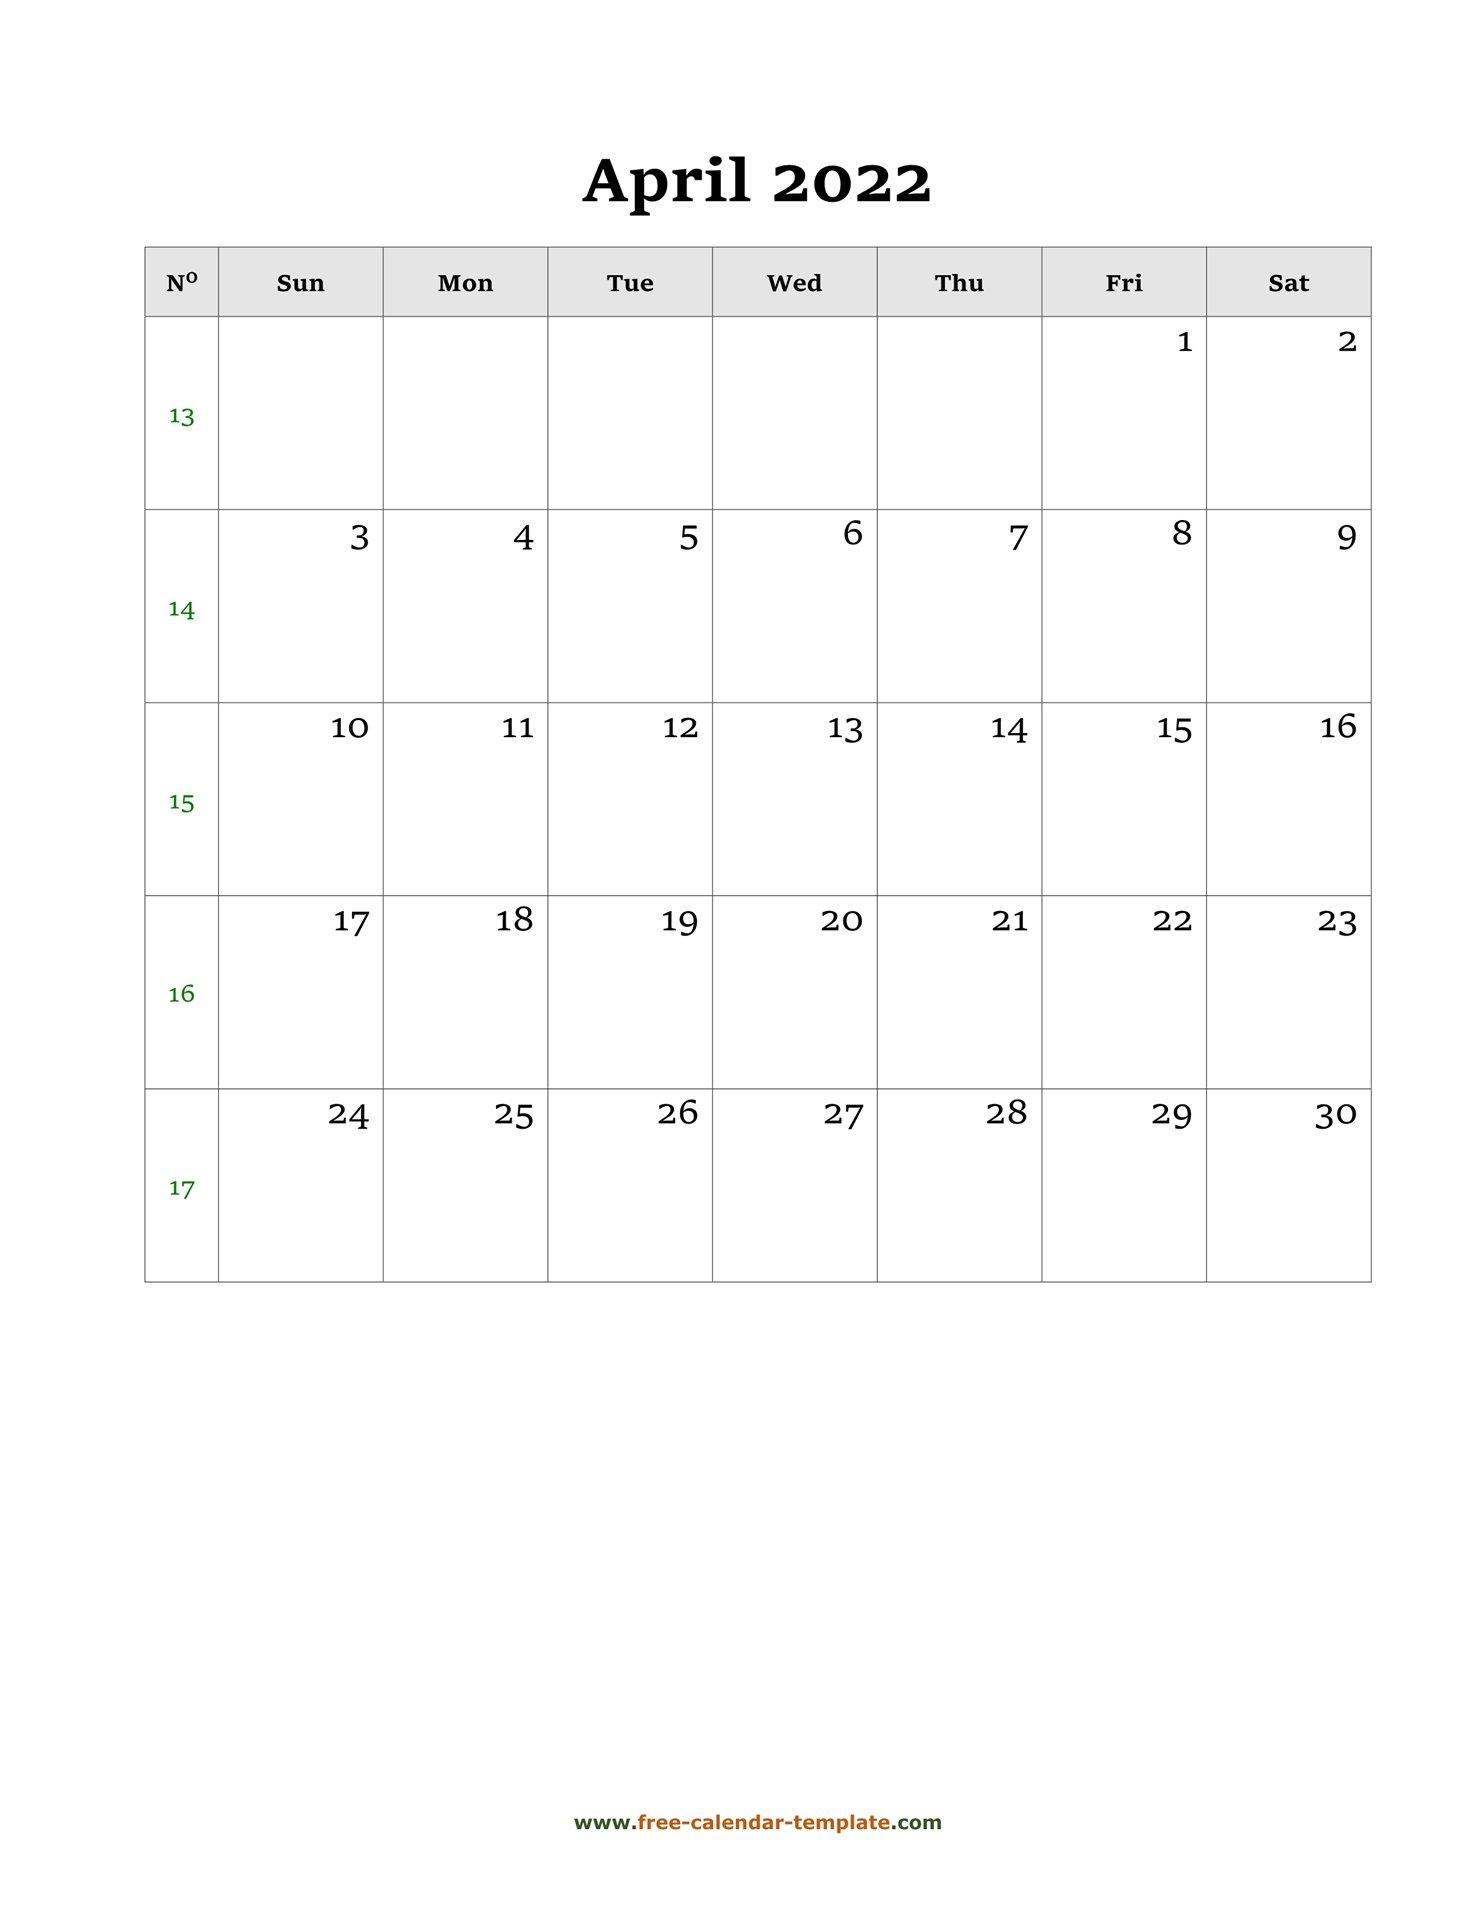 April Calendar 2022 Simple Design With Large Box On Each throughout April 2022 Printable Calendar Free Photo